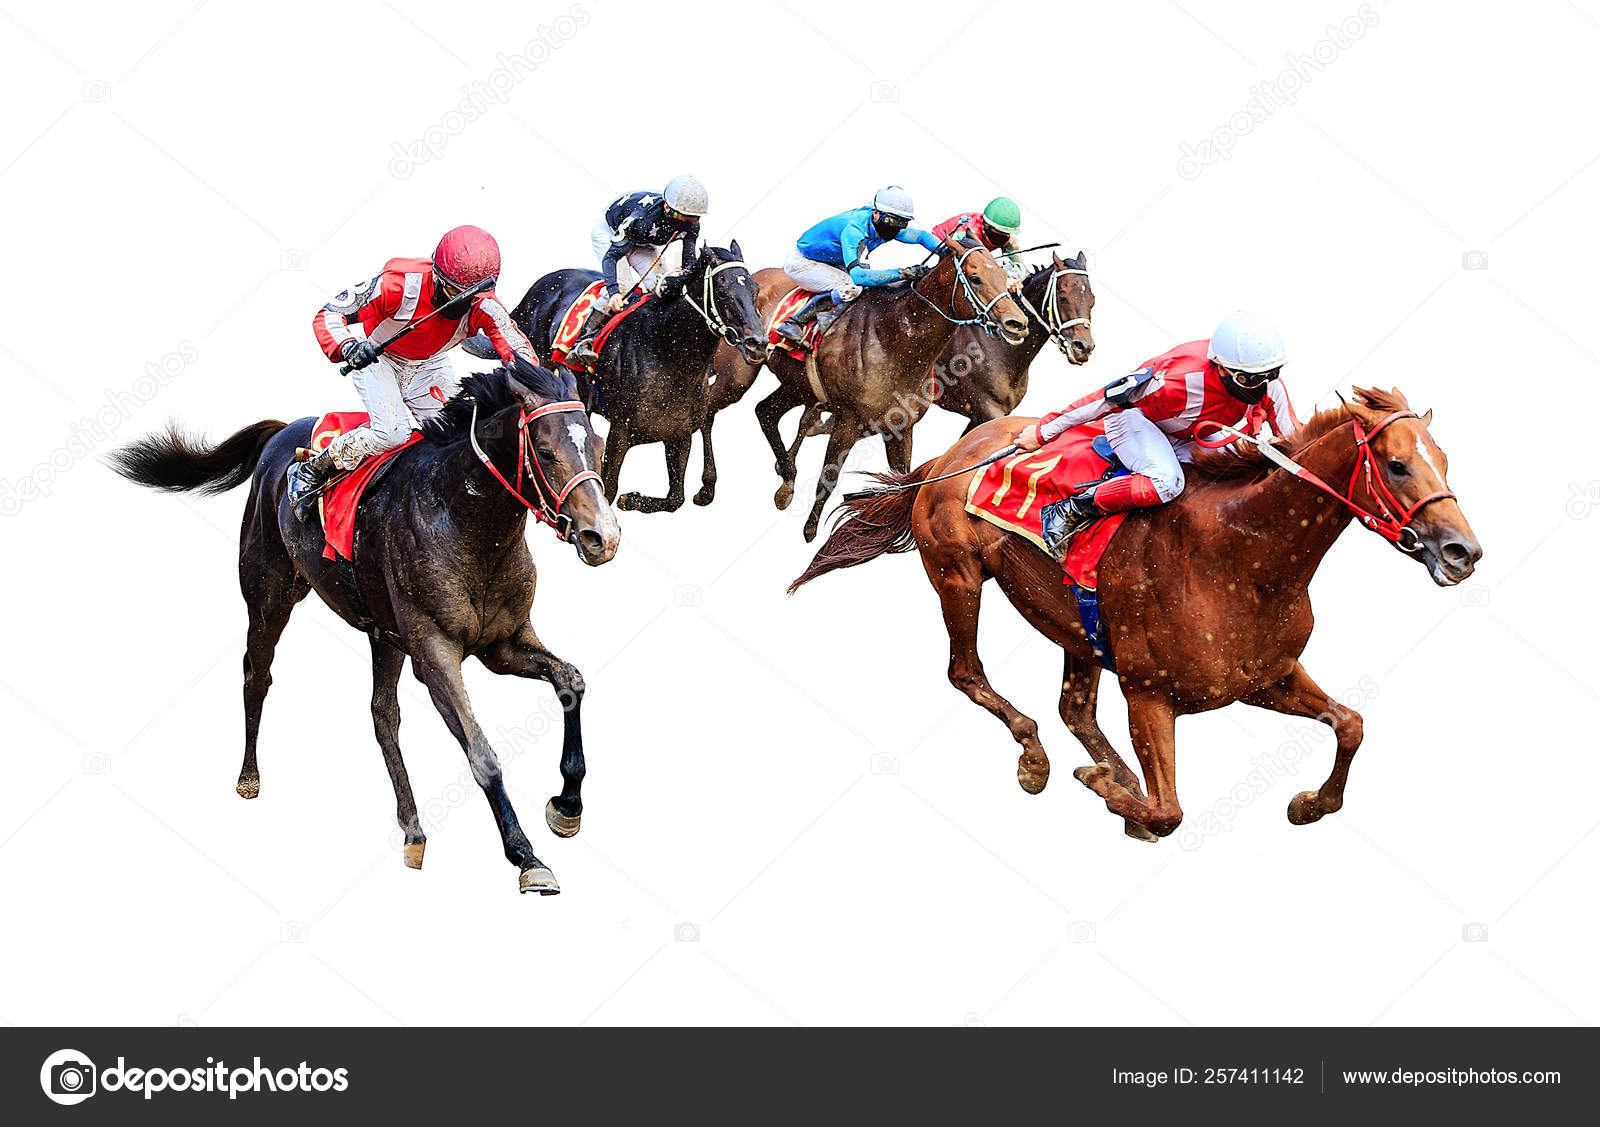 Jockey Horse Racing Horse Isolated White Background Stock Photo C Dikkenss 257411142